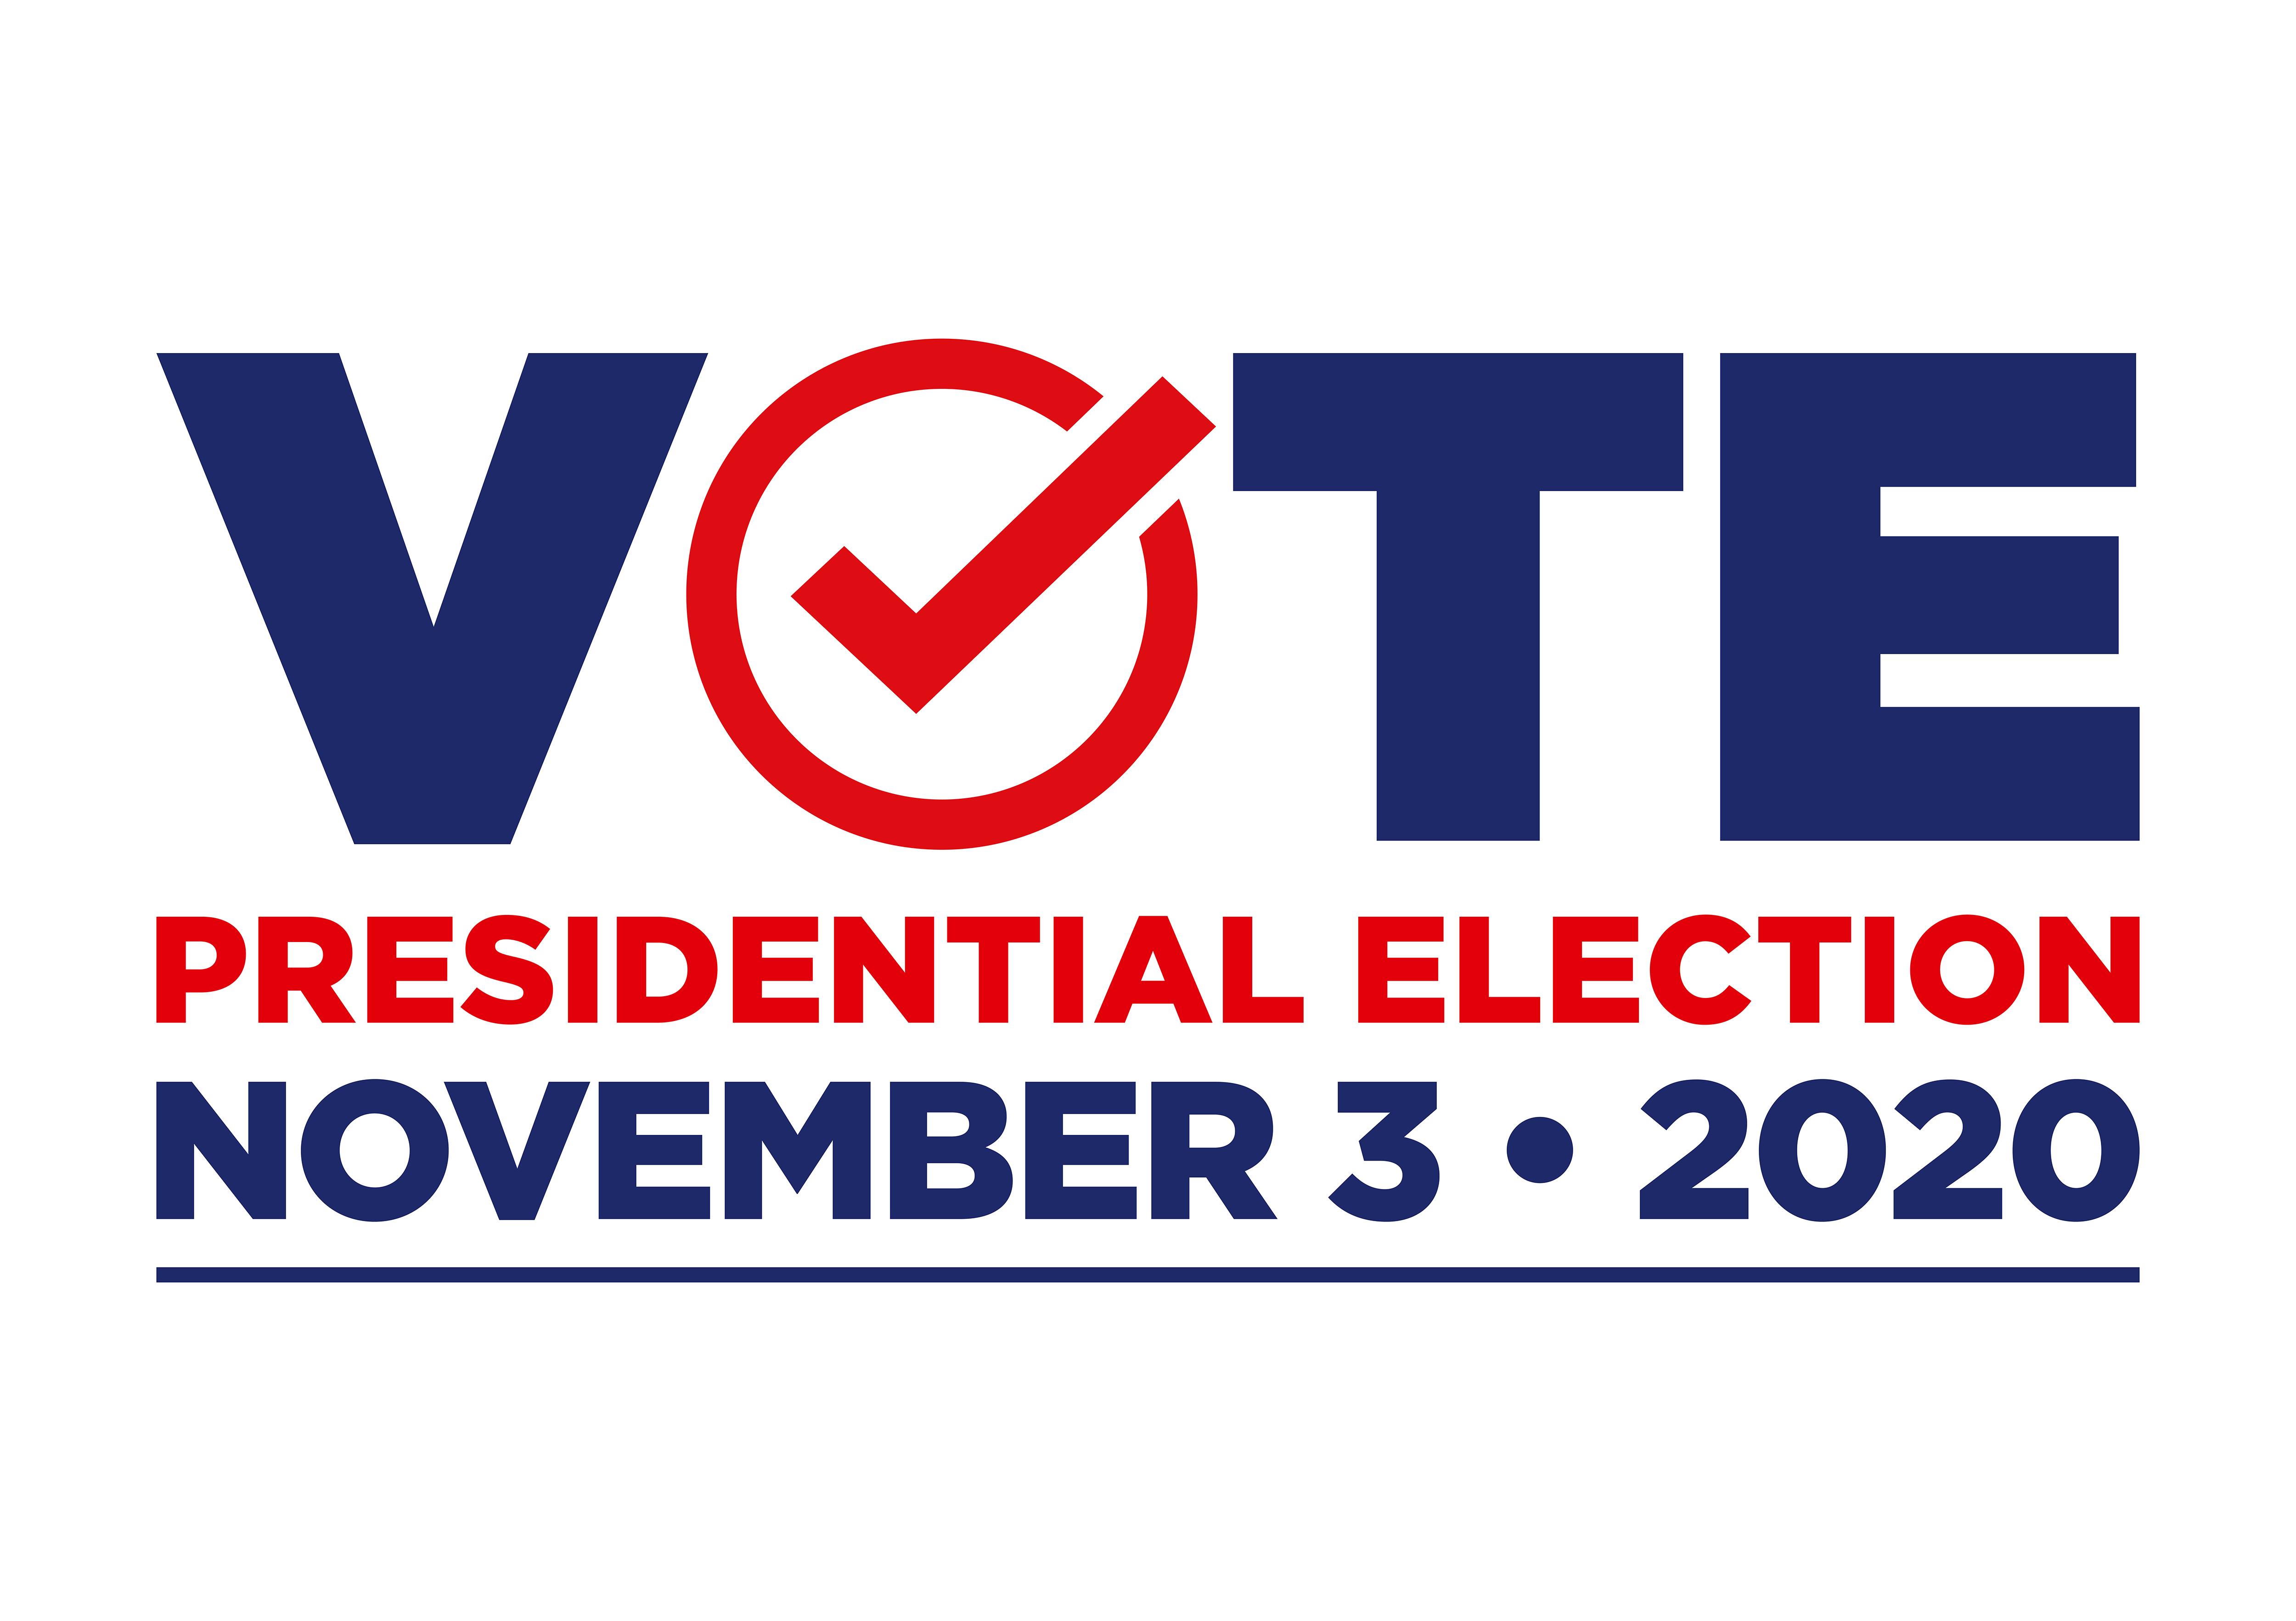 Pramod Kunju, CEO of Data, Analytics & AI Company Nakunj, Demystifies the 2020 US Presidential Elections